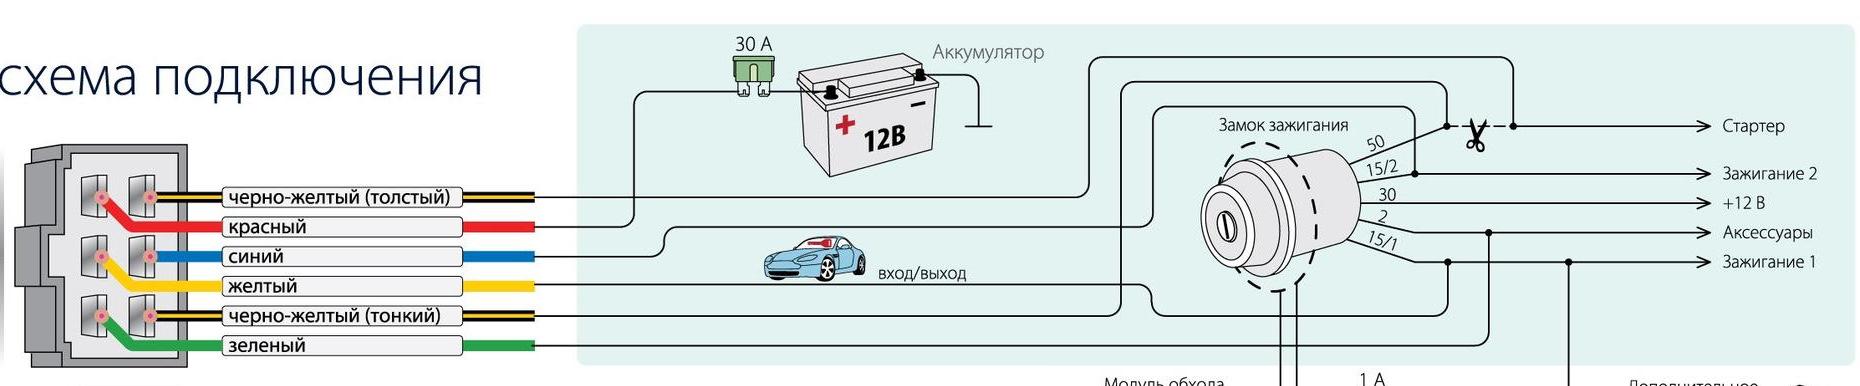 подключение сигнализации с автозапуском